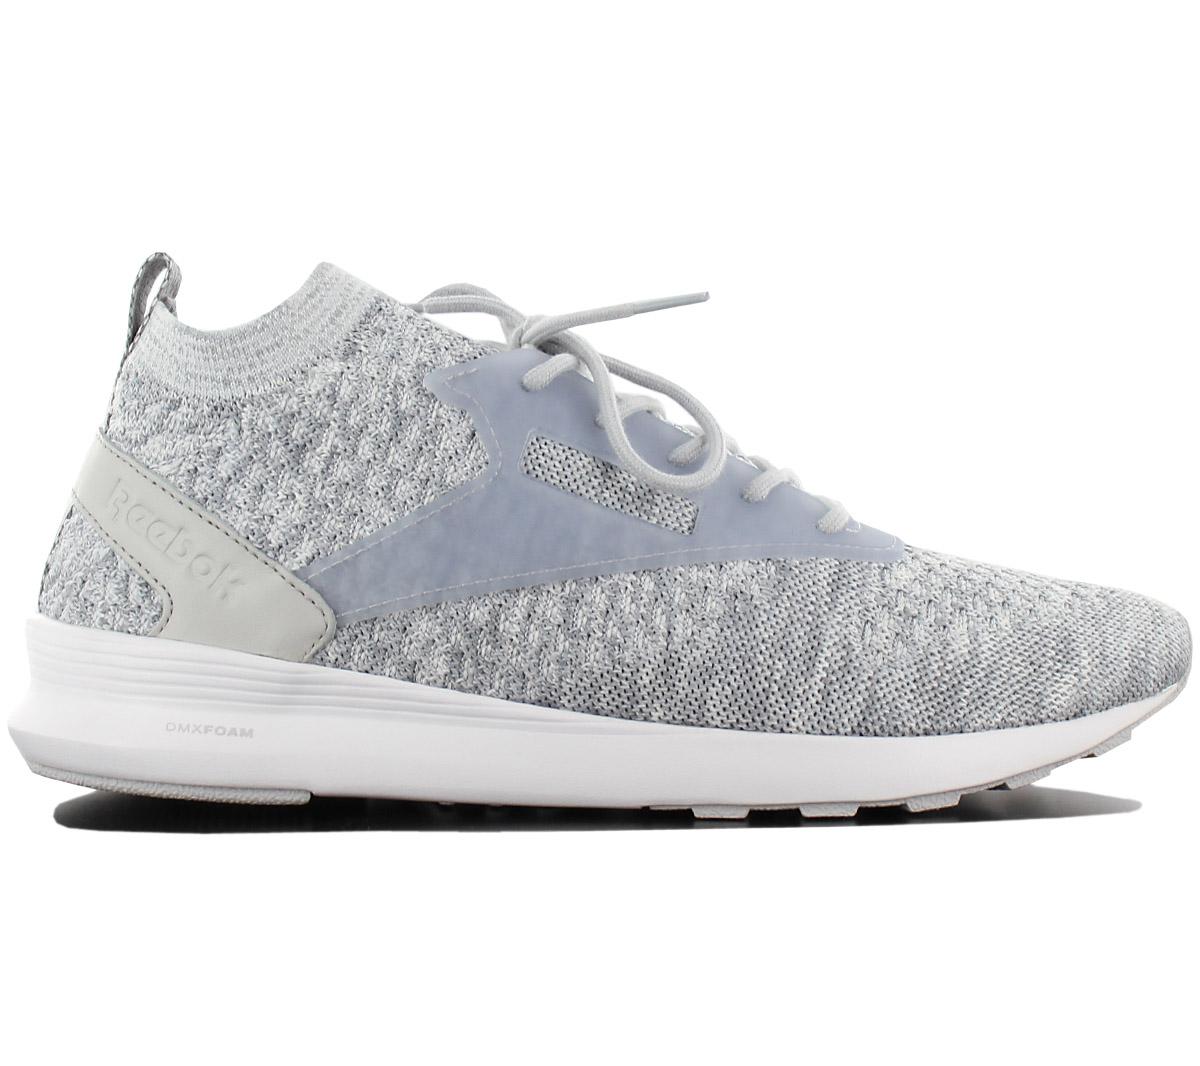 2220a5c8613 Reebok Zoku Runner Ultk Ultraknit Htrd Men s Sneakers Classics Shoes ...